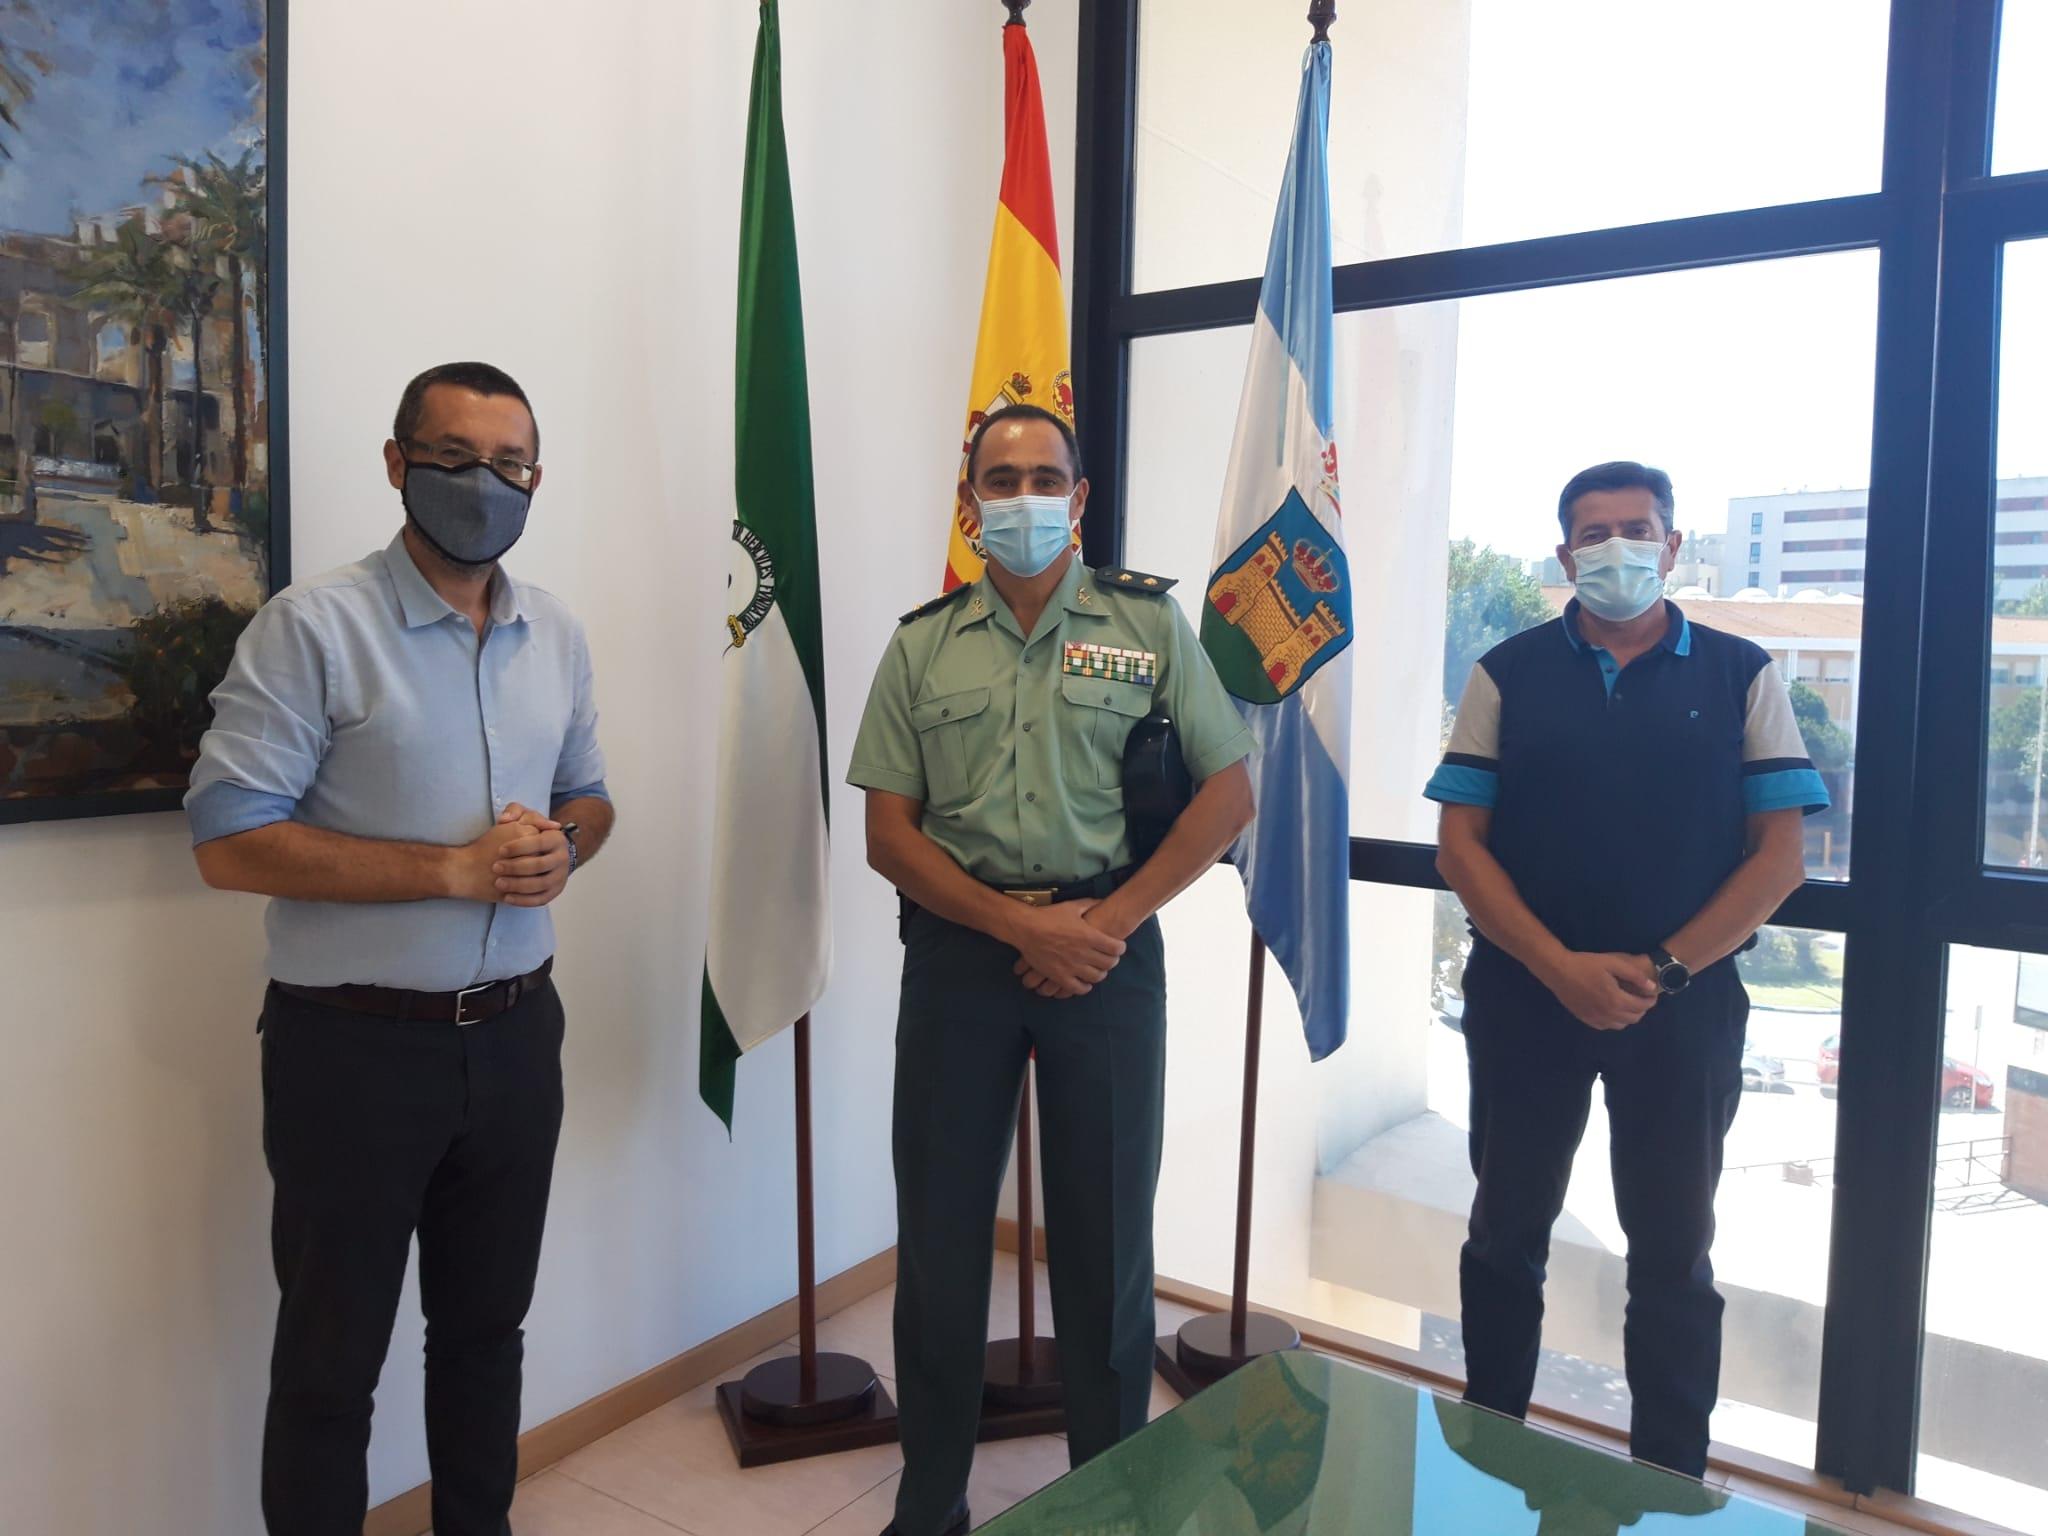 RECEPCION NUEVO JEFE DE LA COMANDANCIA DE LA GUARDIA CIVIL DE ALGECIRAS